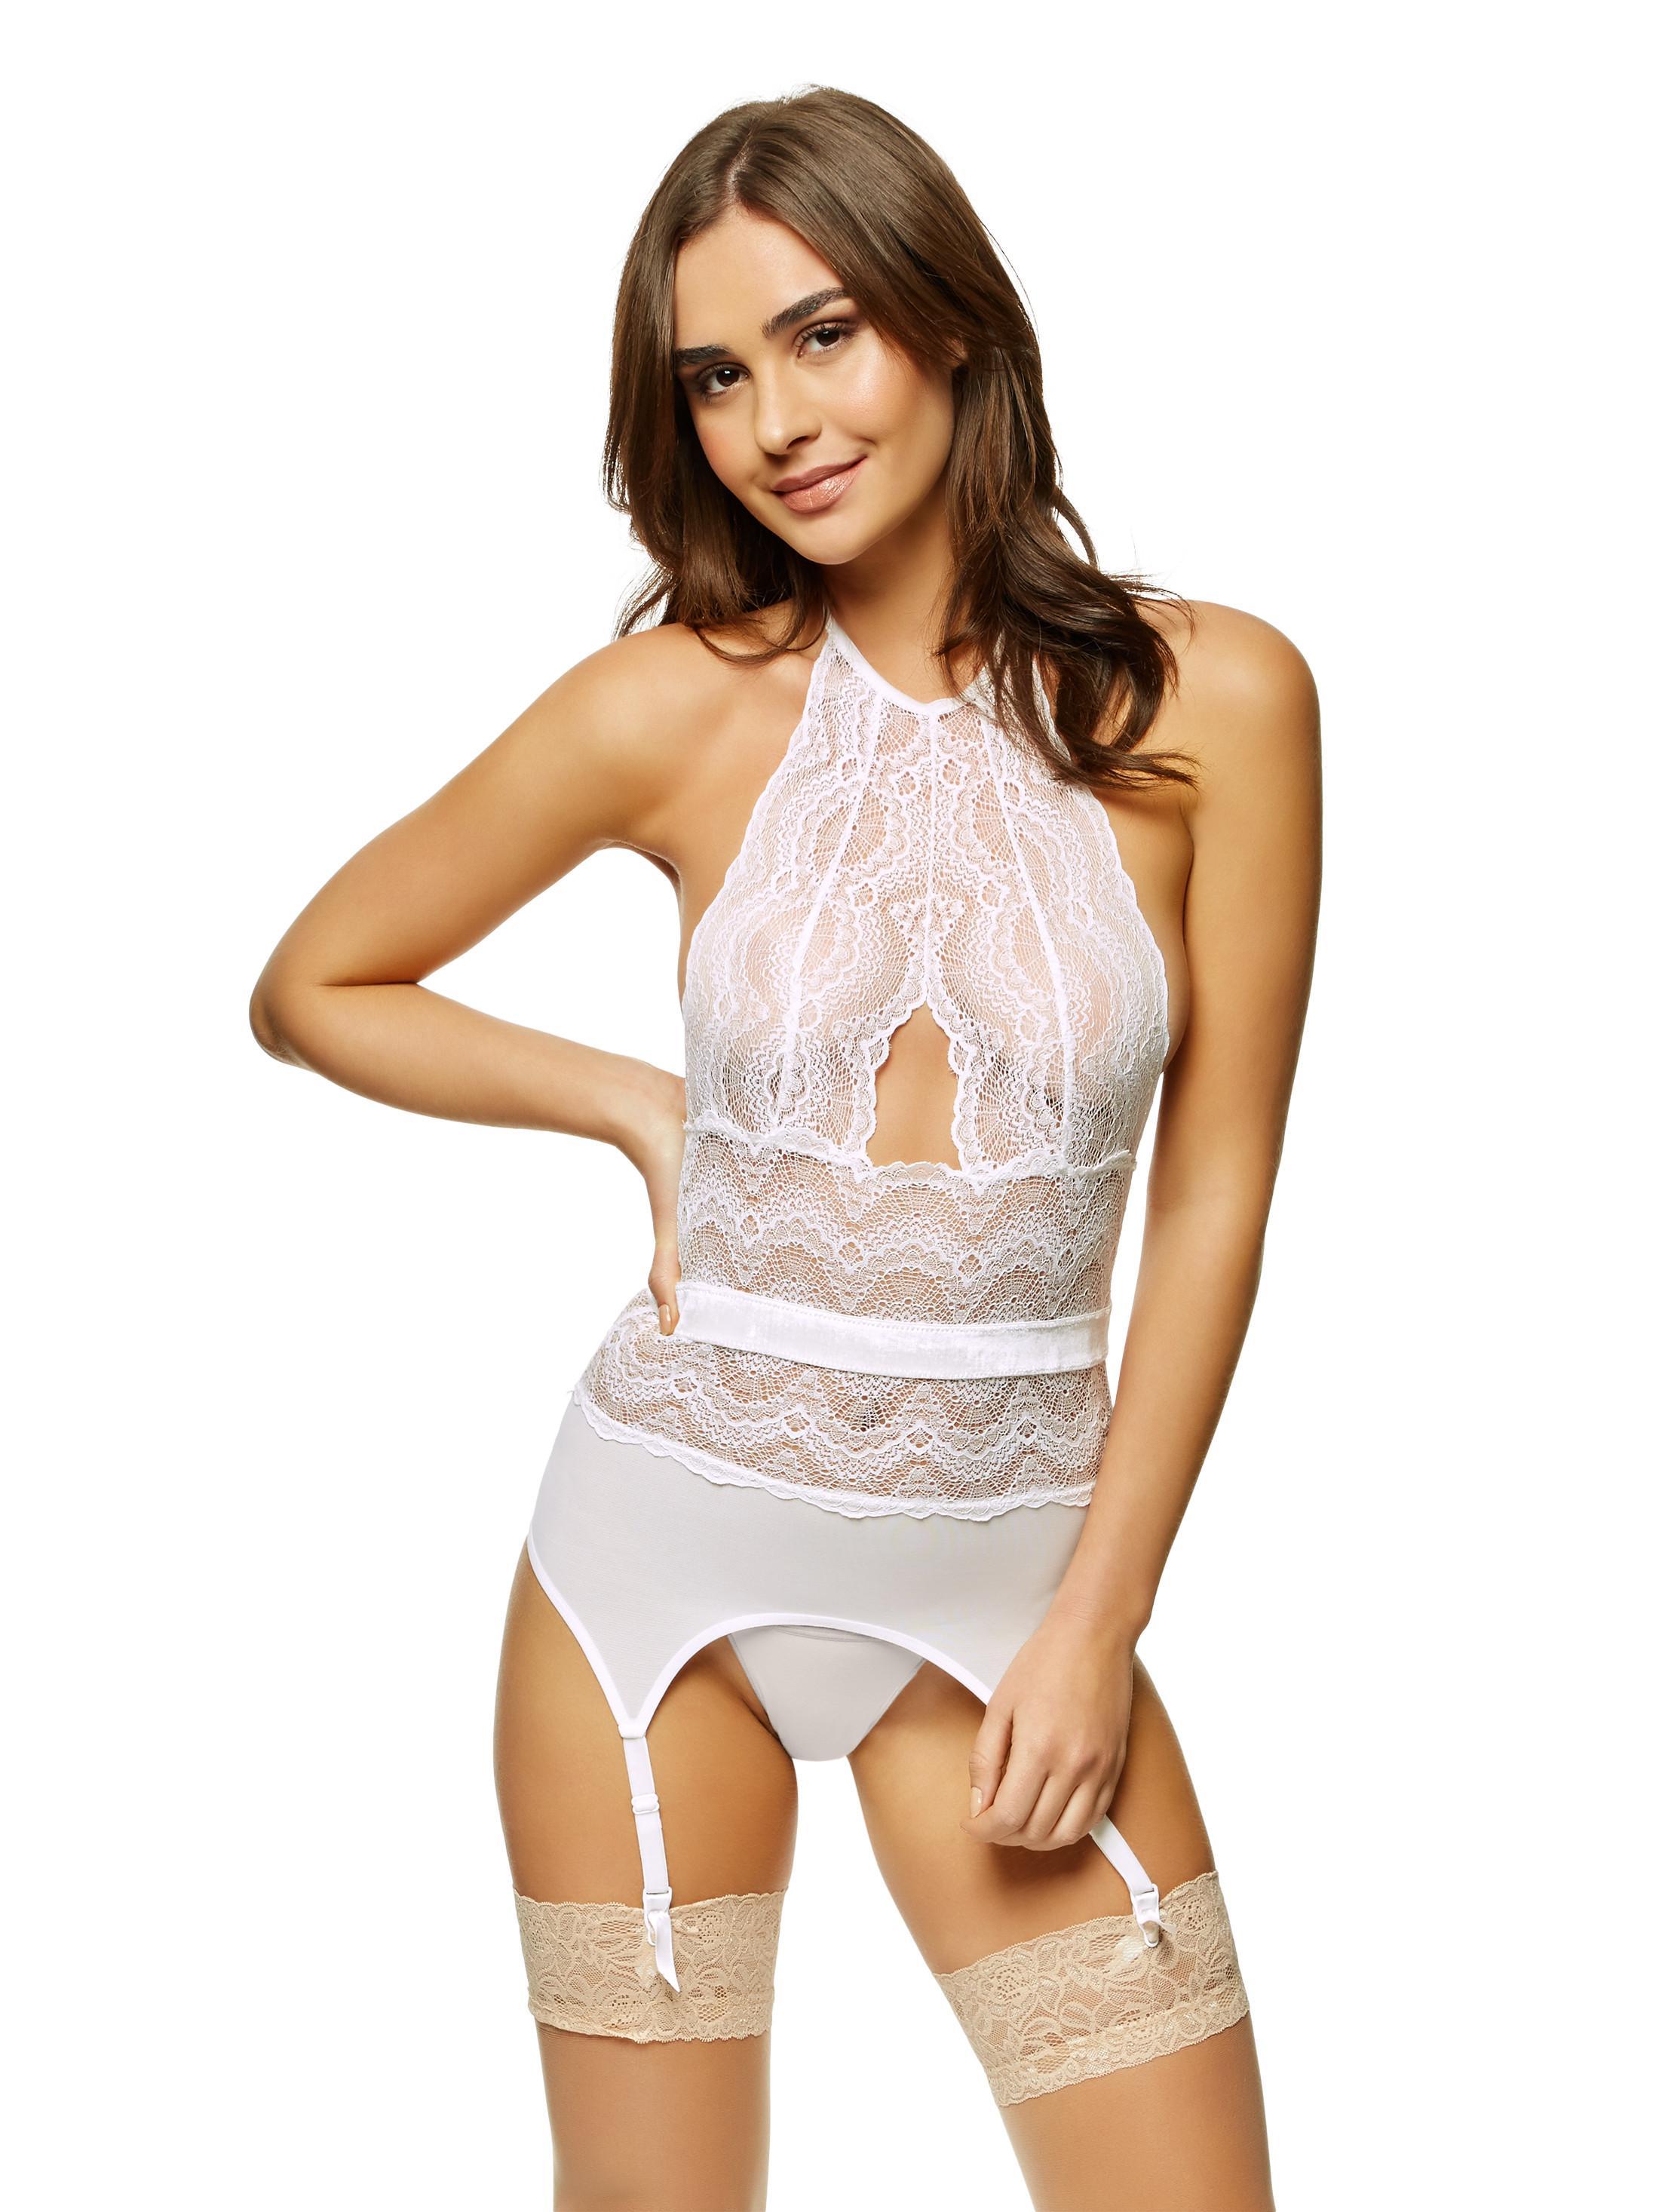 f4dc6f37fc Details about Ann Summers Womens Darrah Cami Suspender High Neck Sexy  Lingerie Underwear